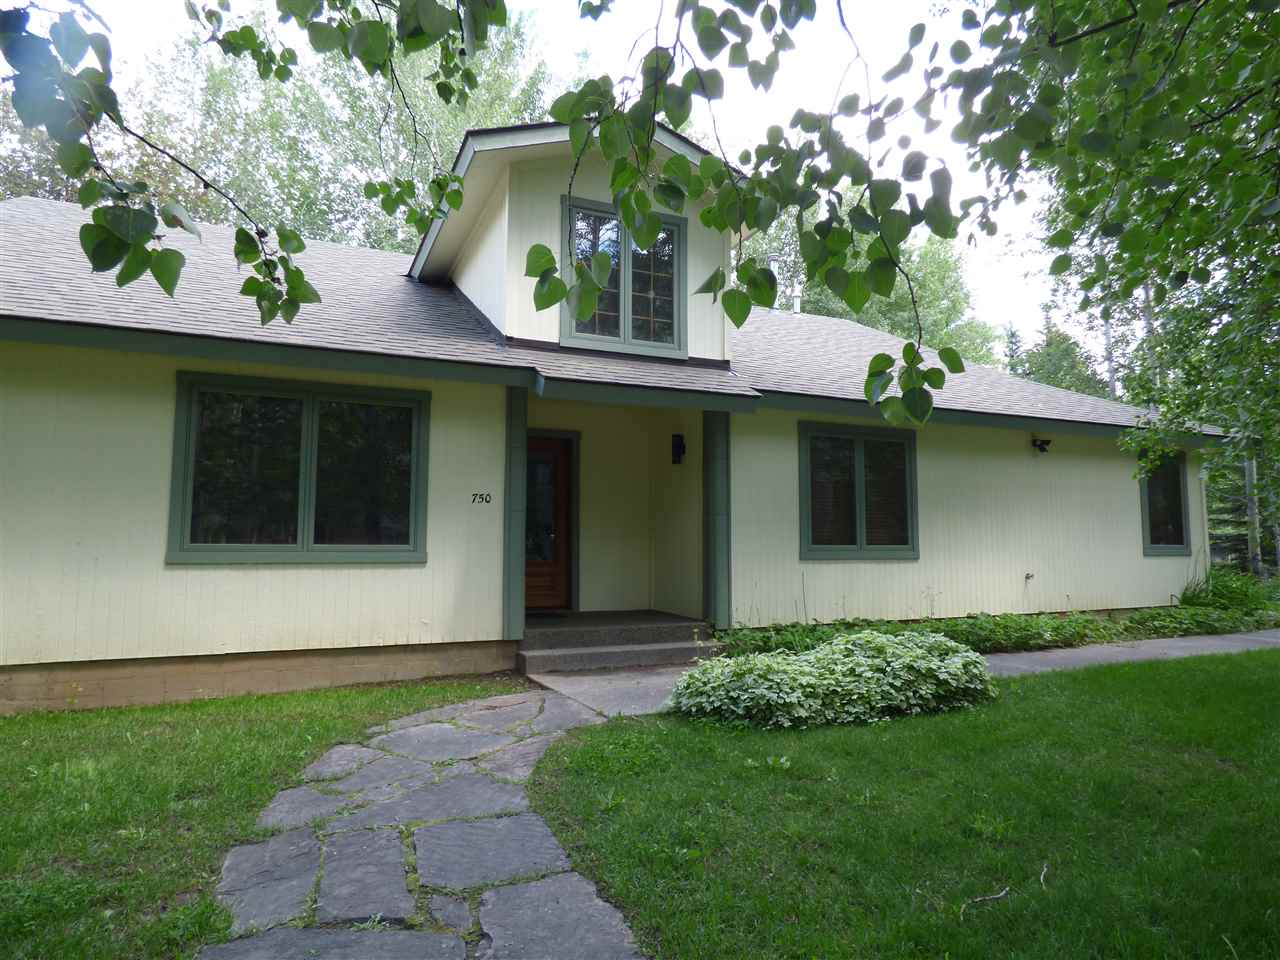 Single Family Home for Sale at 750 Robin Hood 750 Robin Hood Hailey, Idaho 83333